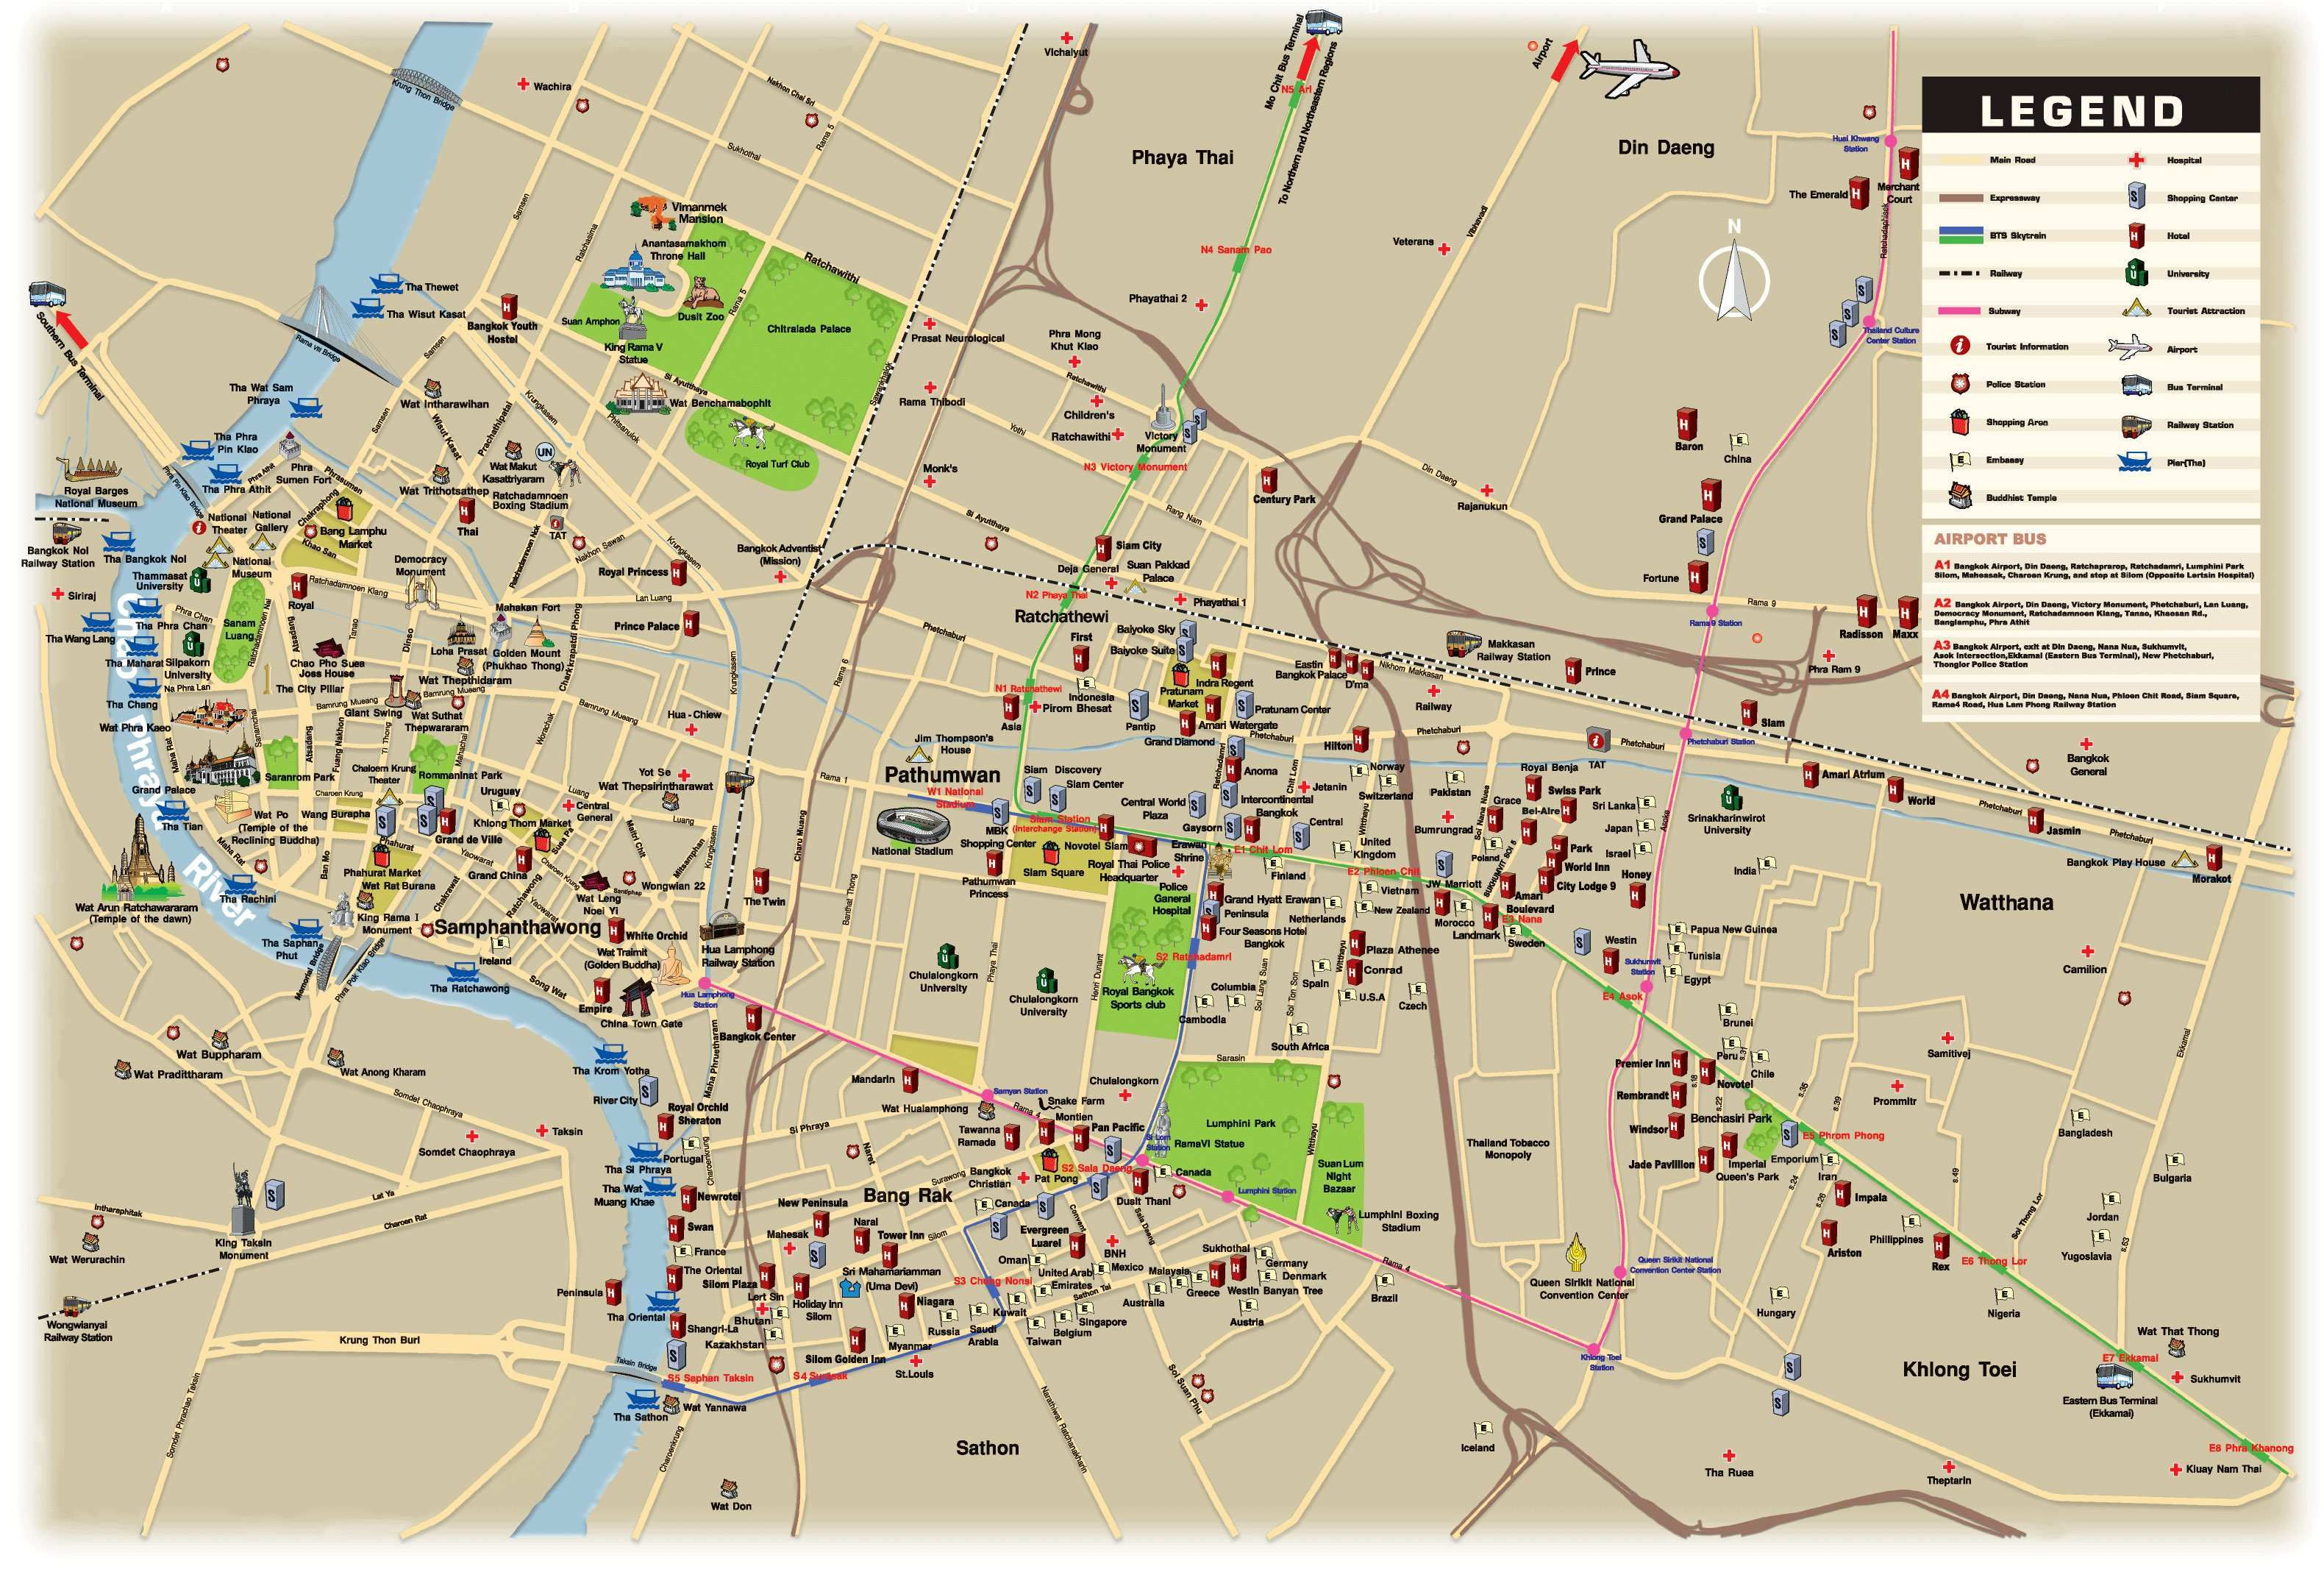 Carte Bangkok Routes Metro Informations Hopitaux Hotel Aeroport Tranports Jpg 3160 2137 Thailand Reisen Thailand Reisen